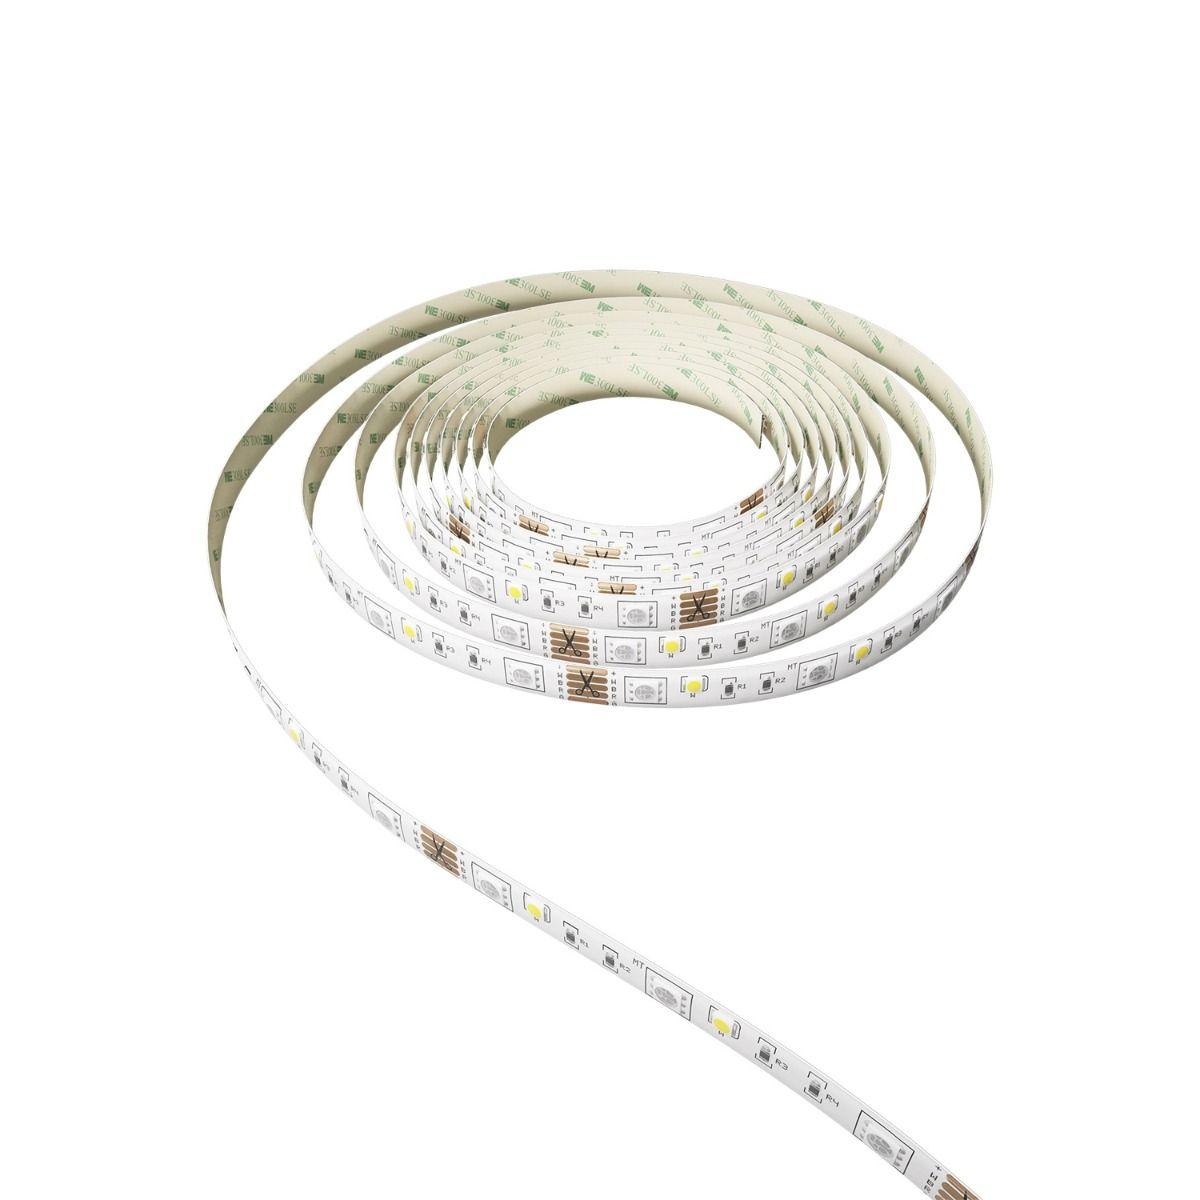 Calex Smart RGB + White Led Strip 5M | Tuya Wi-Fi